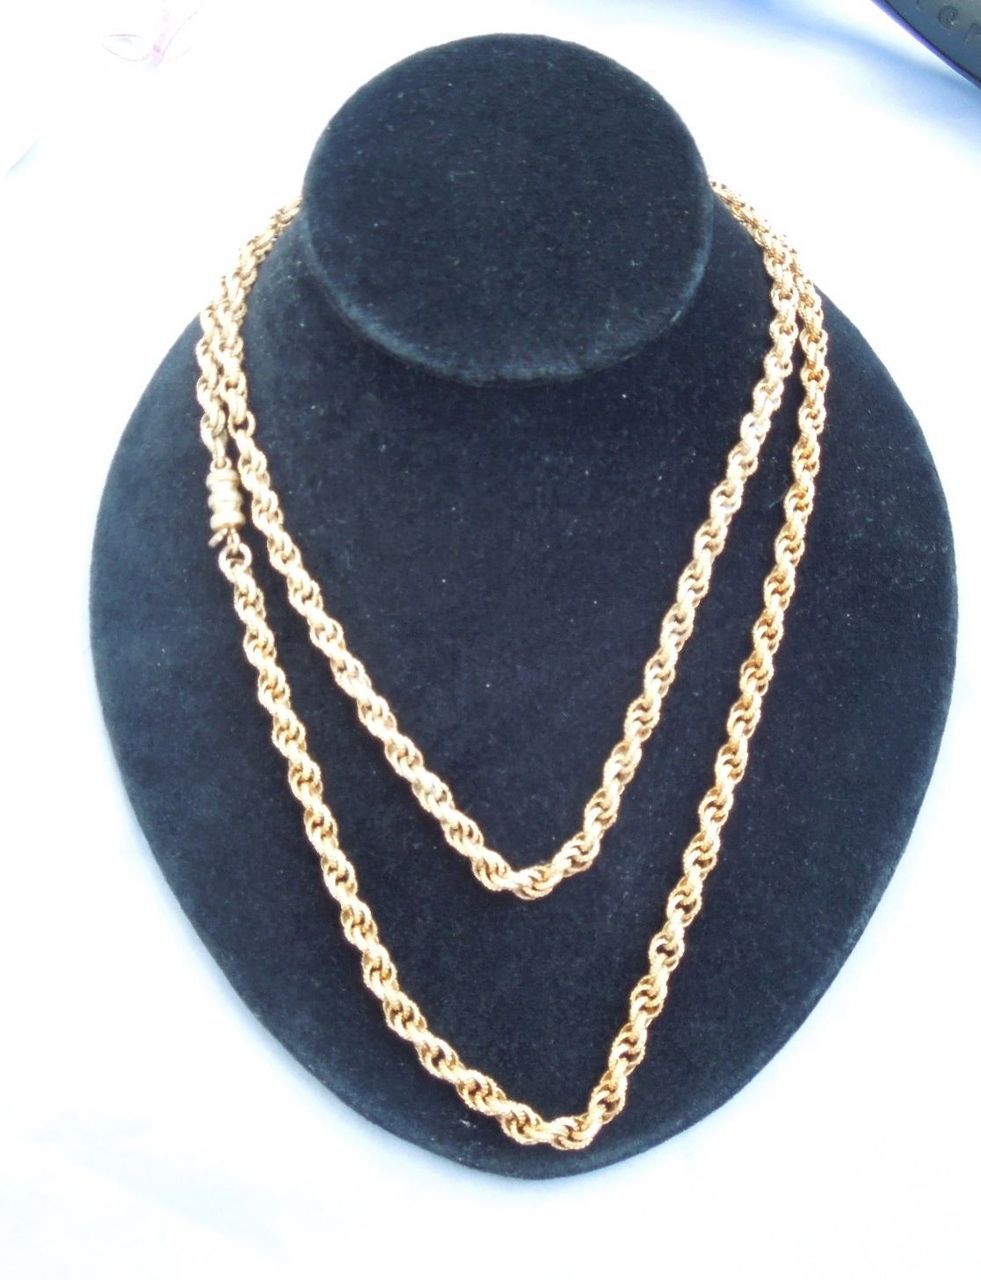 Georgian Chain, 38 inches, Pinchbeck